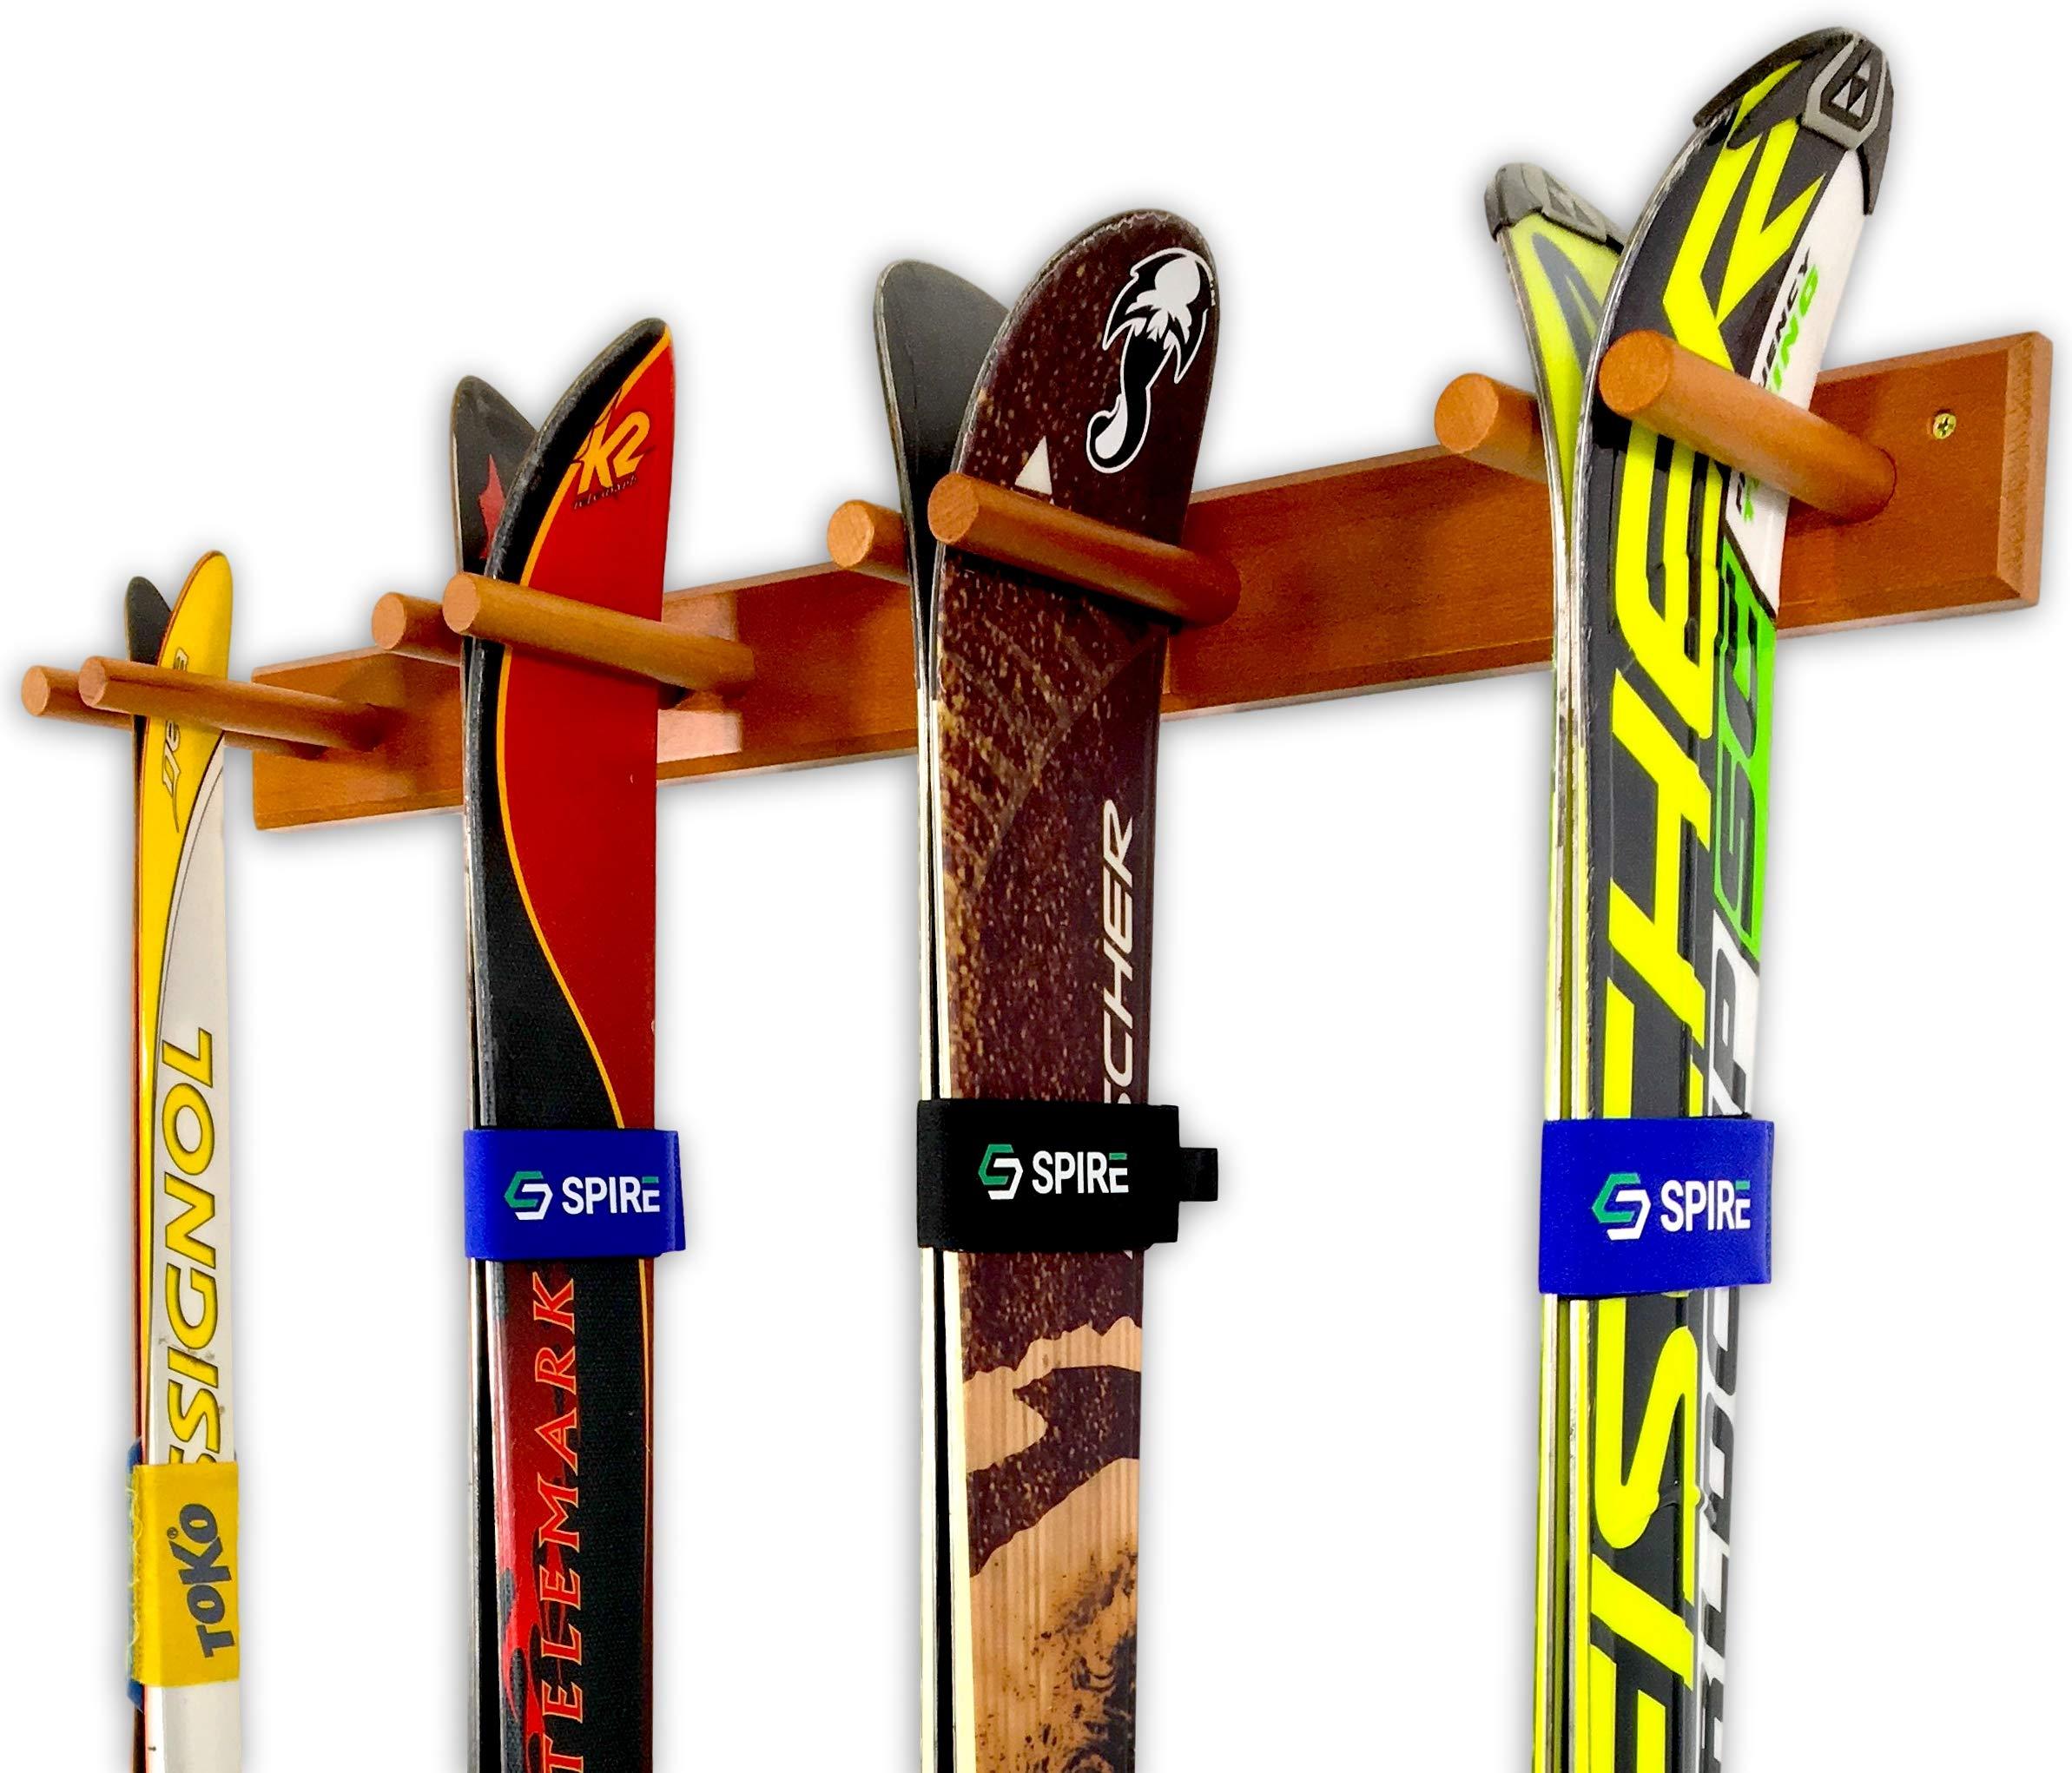 Timber Ski Wall Rack - 4 Pairs of Skis Storage - Wood Home & Garage Mount System (Cherry)